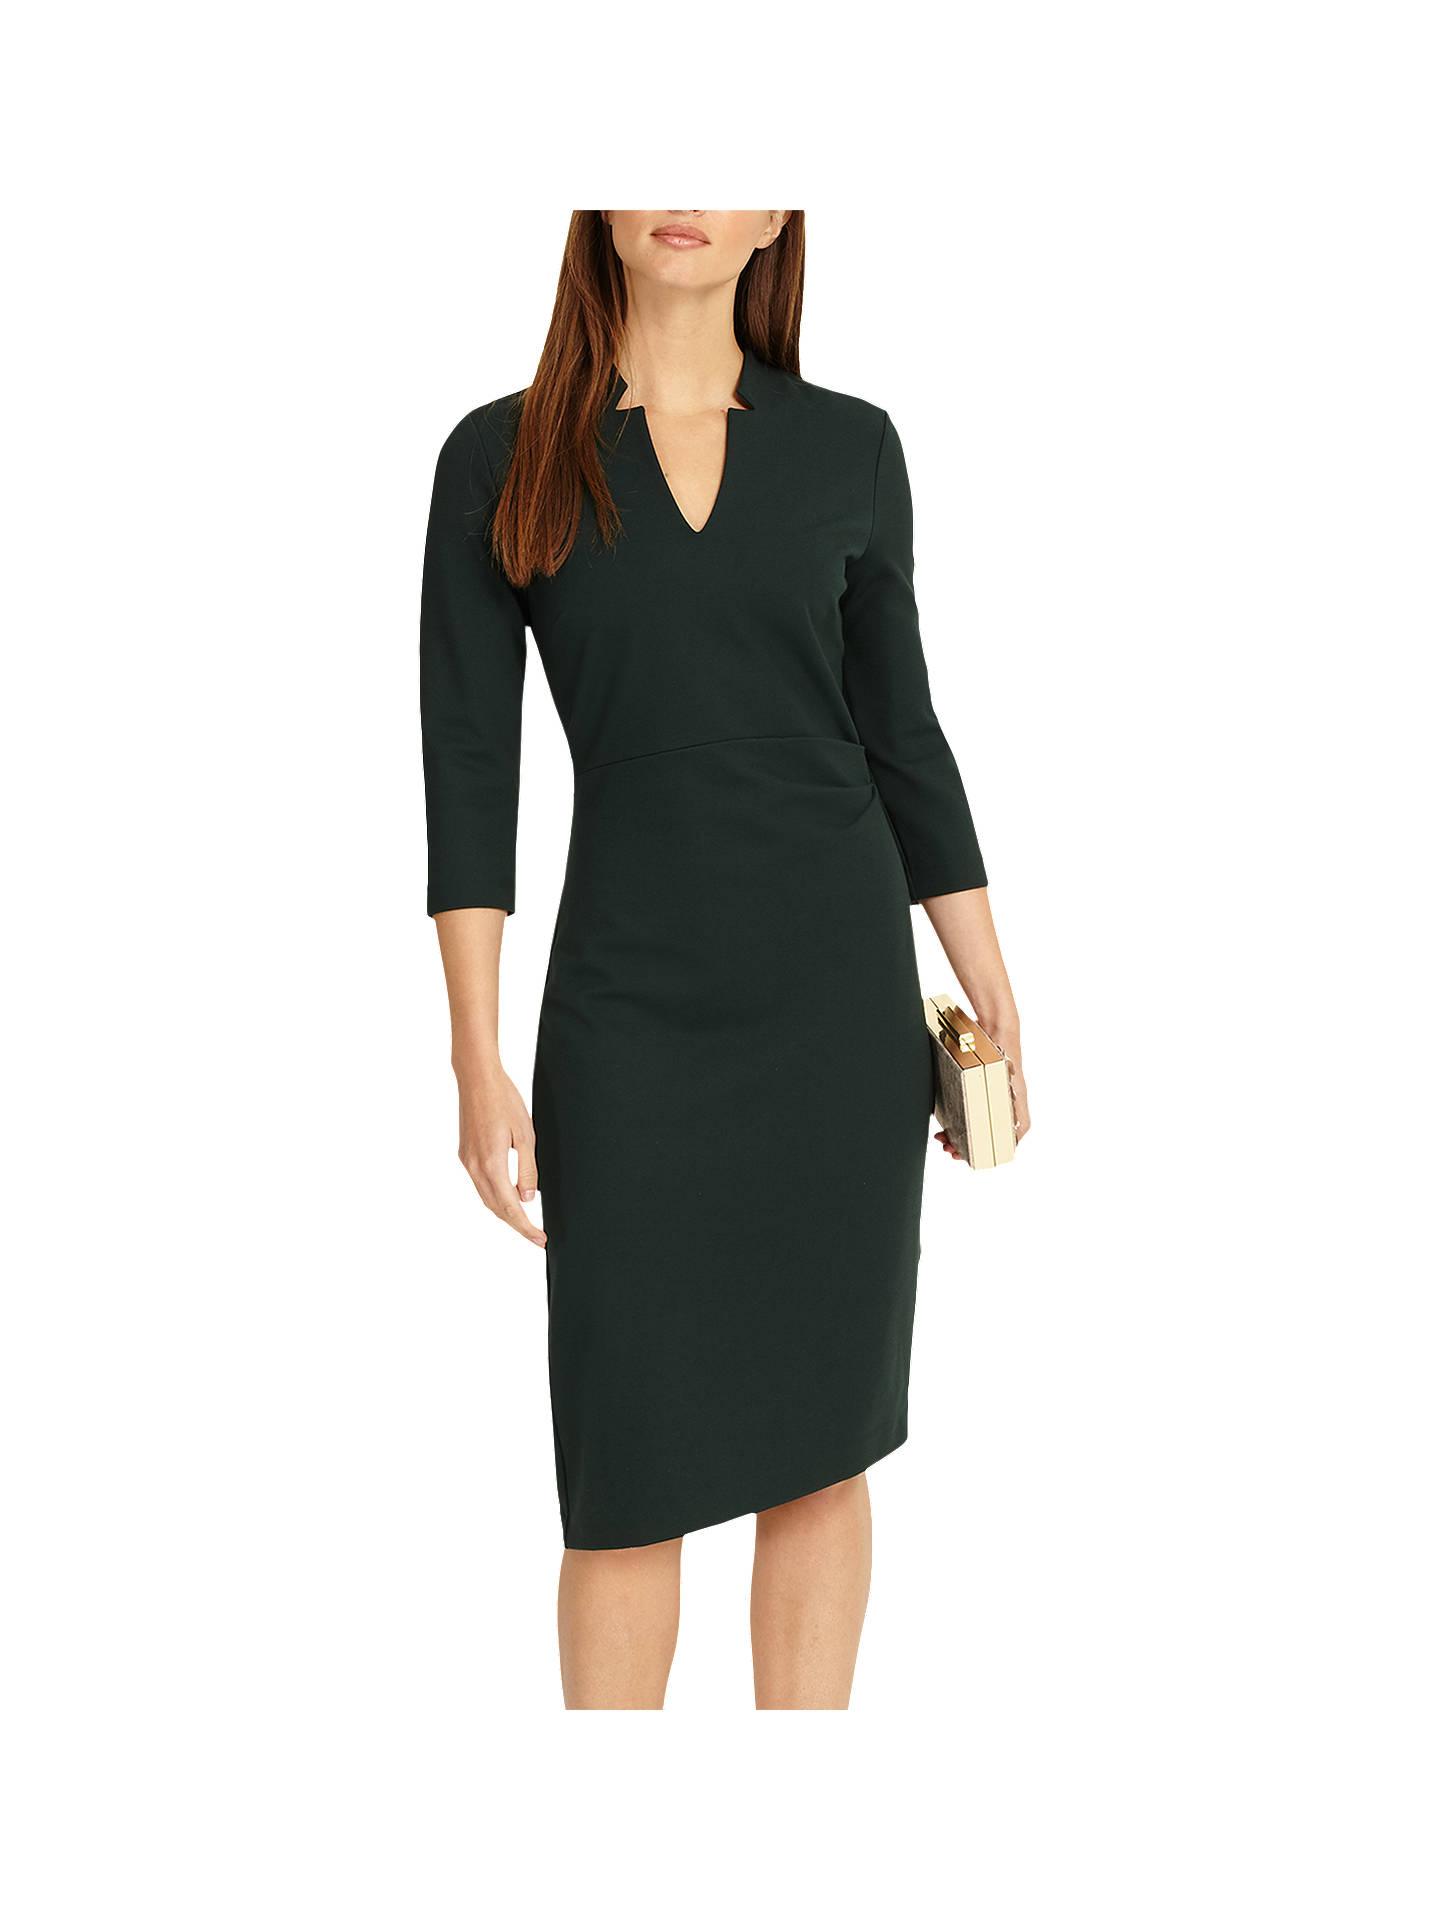 Phase Eight Roisin Dress, Juniper at John Lewis & Partners